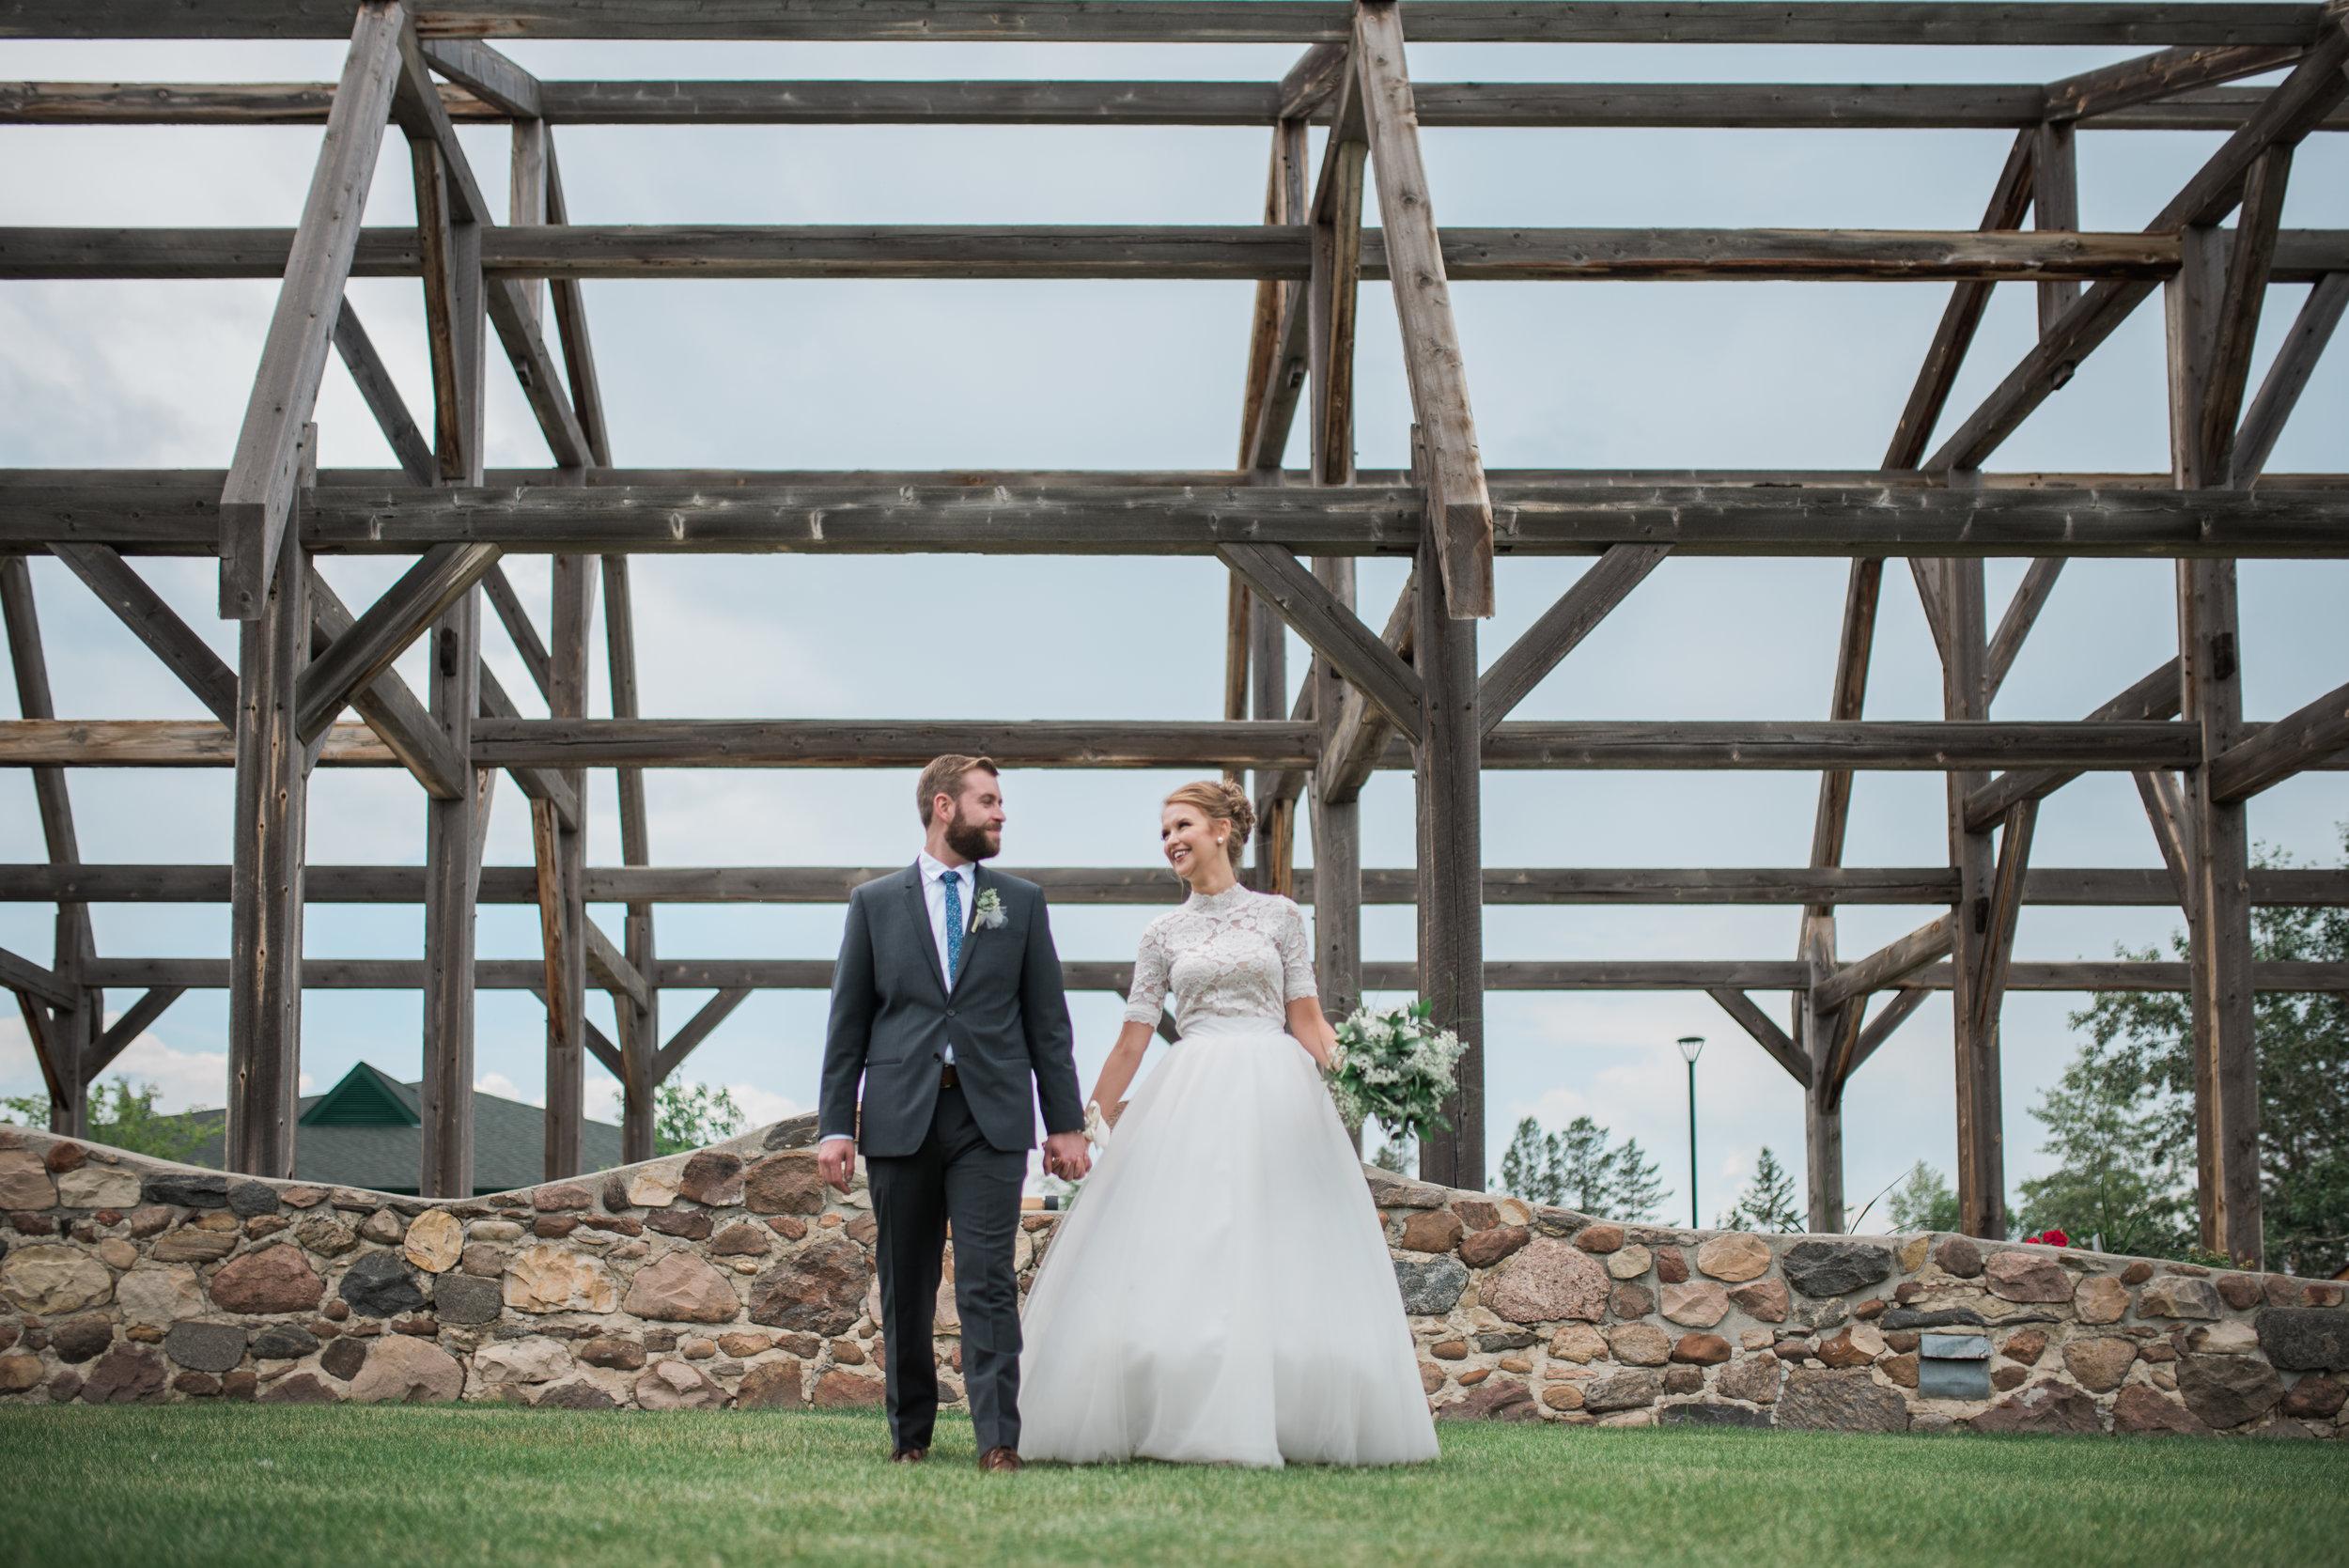 Elgert Wedding 1505.jpg